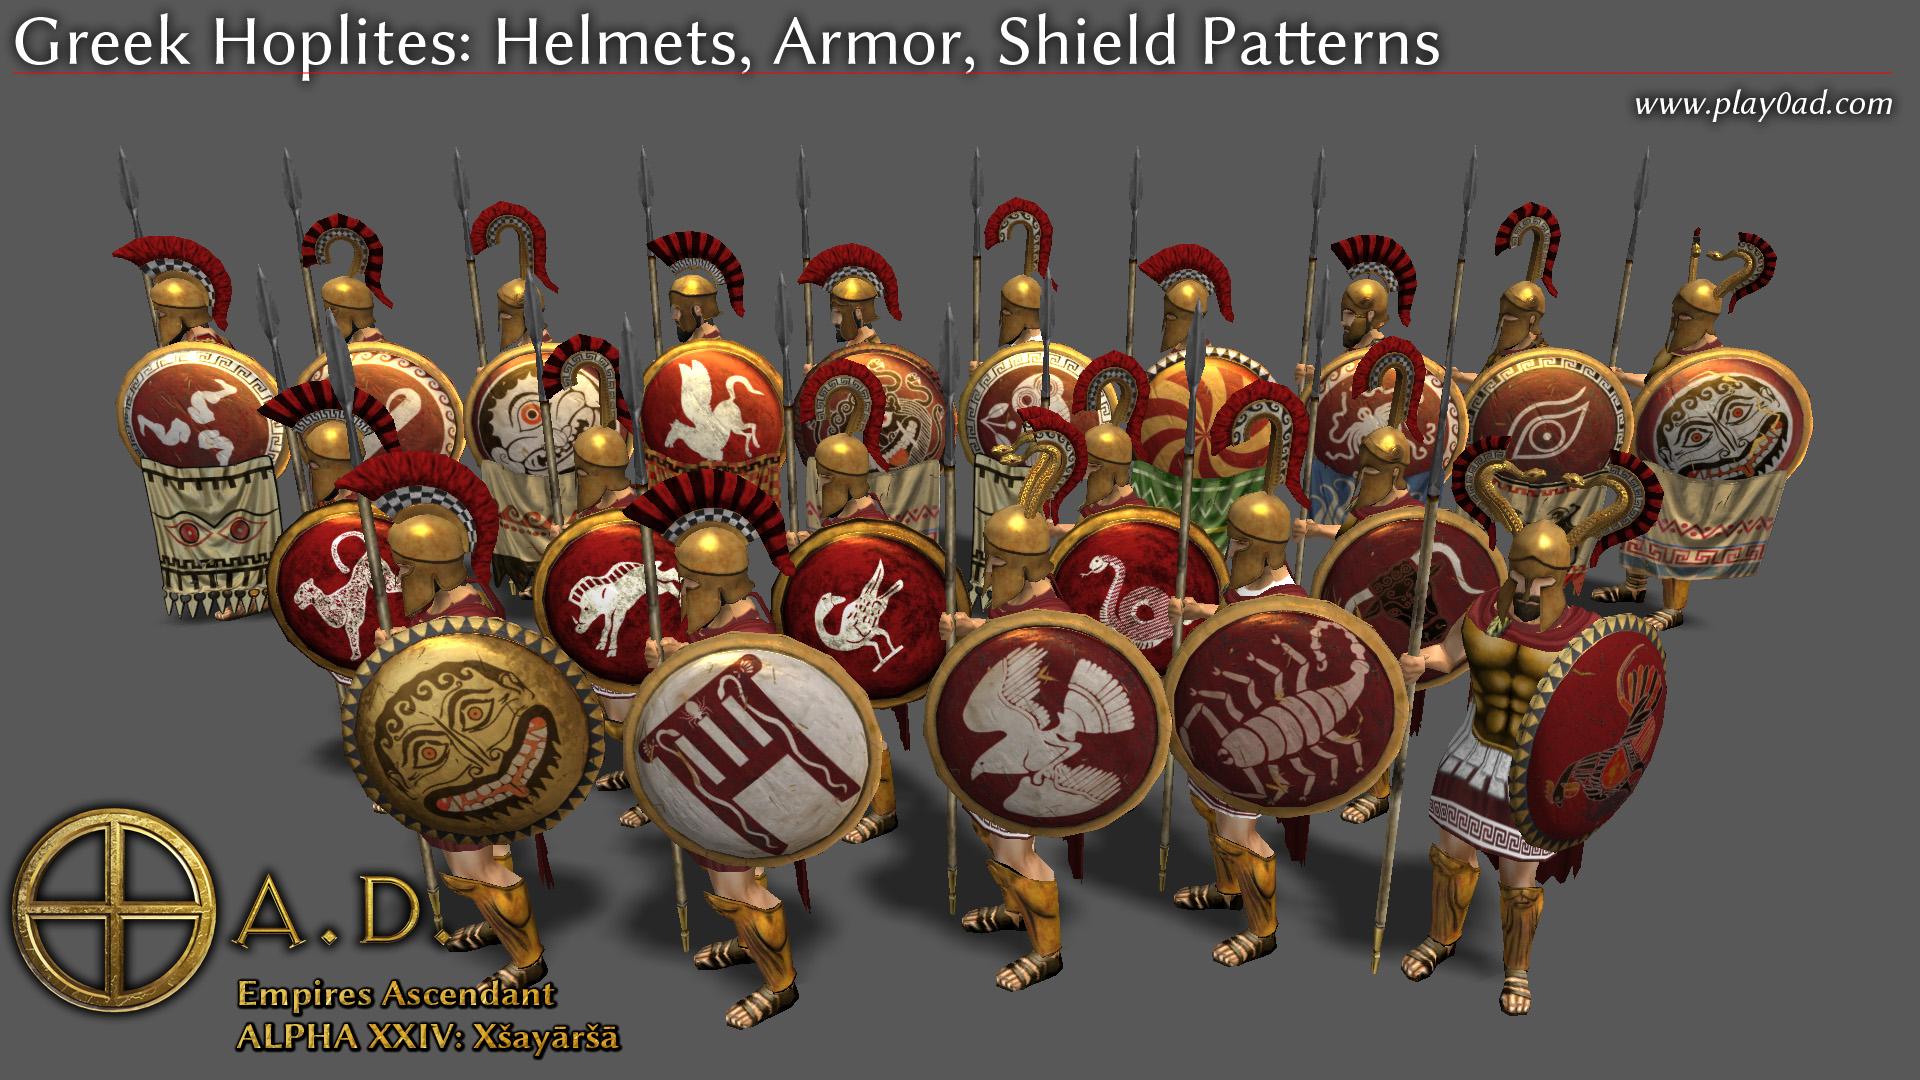 Greek Hoplites: Helmets, Armor, Shield Patterns